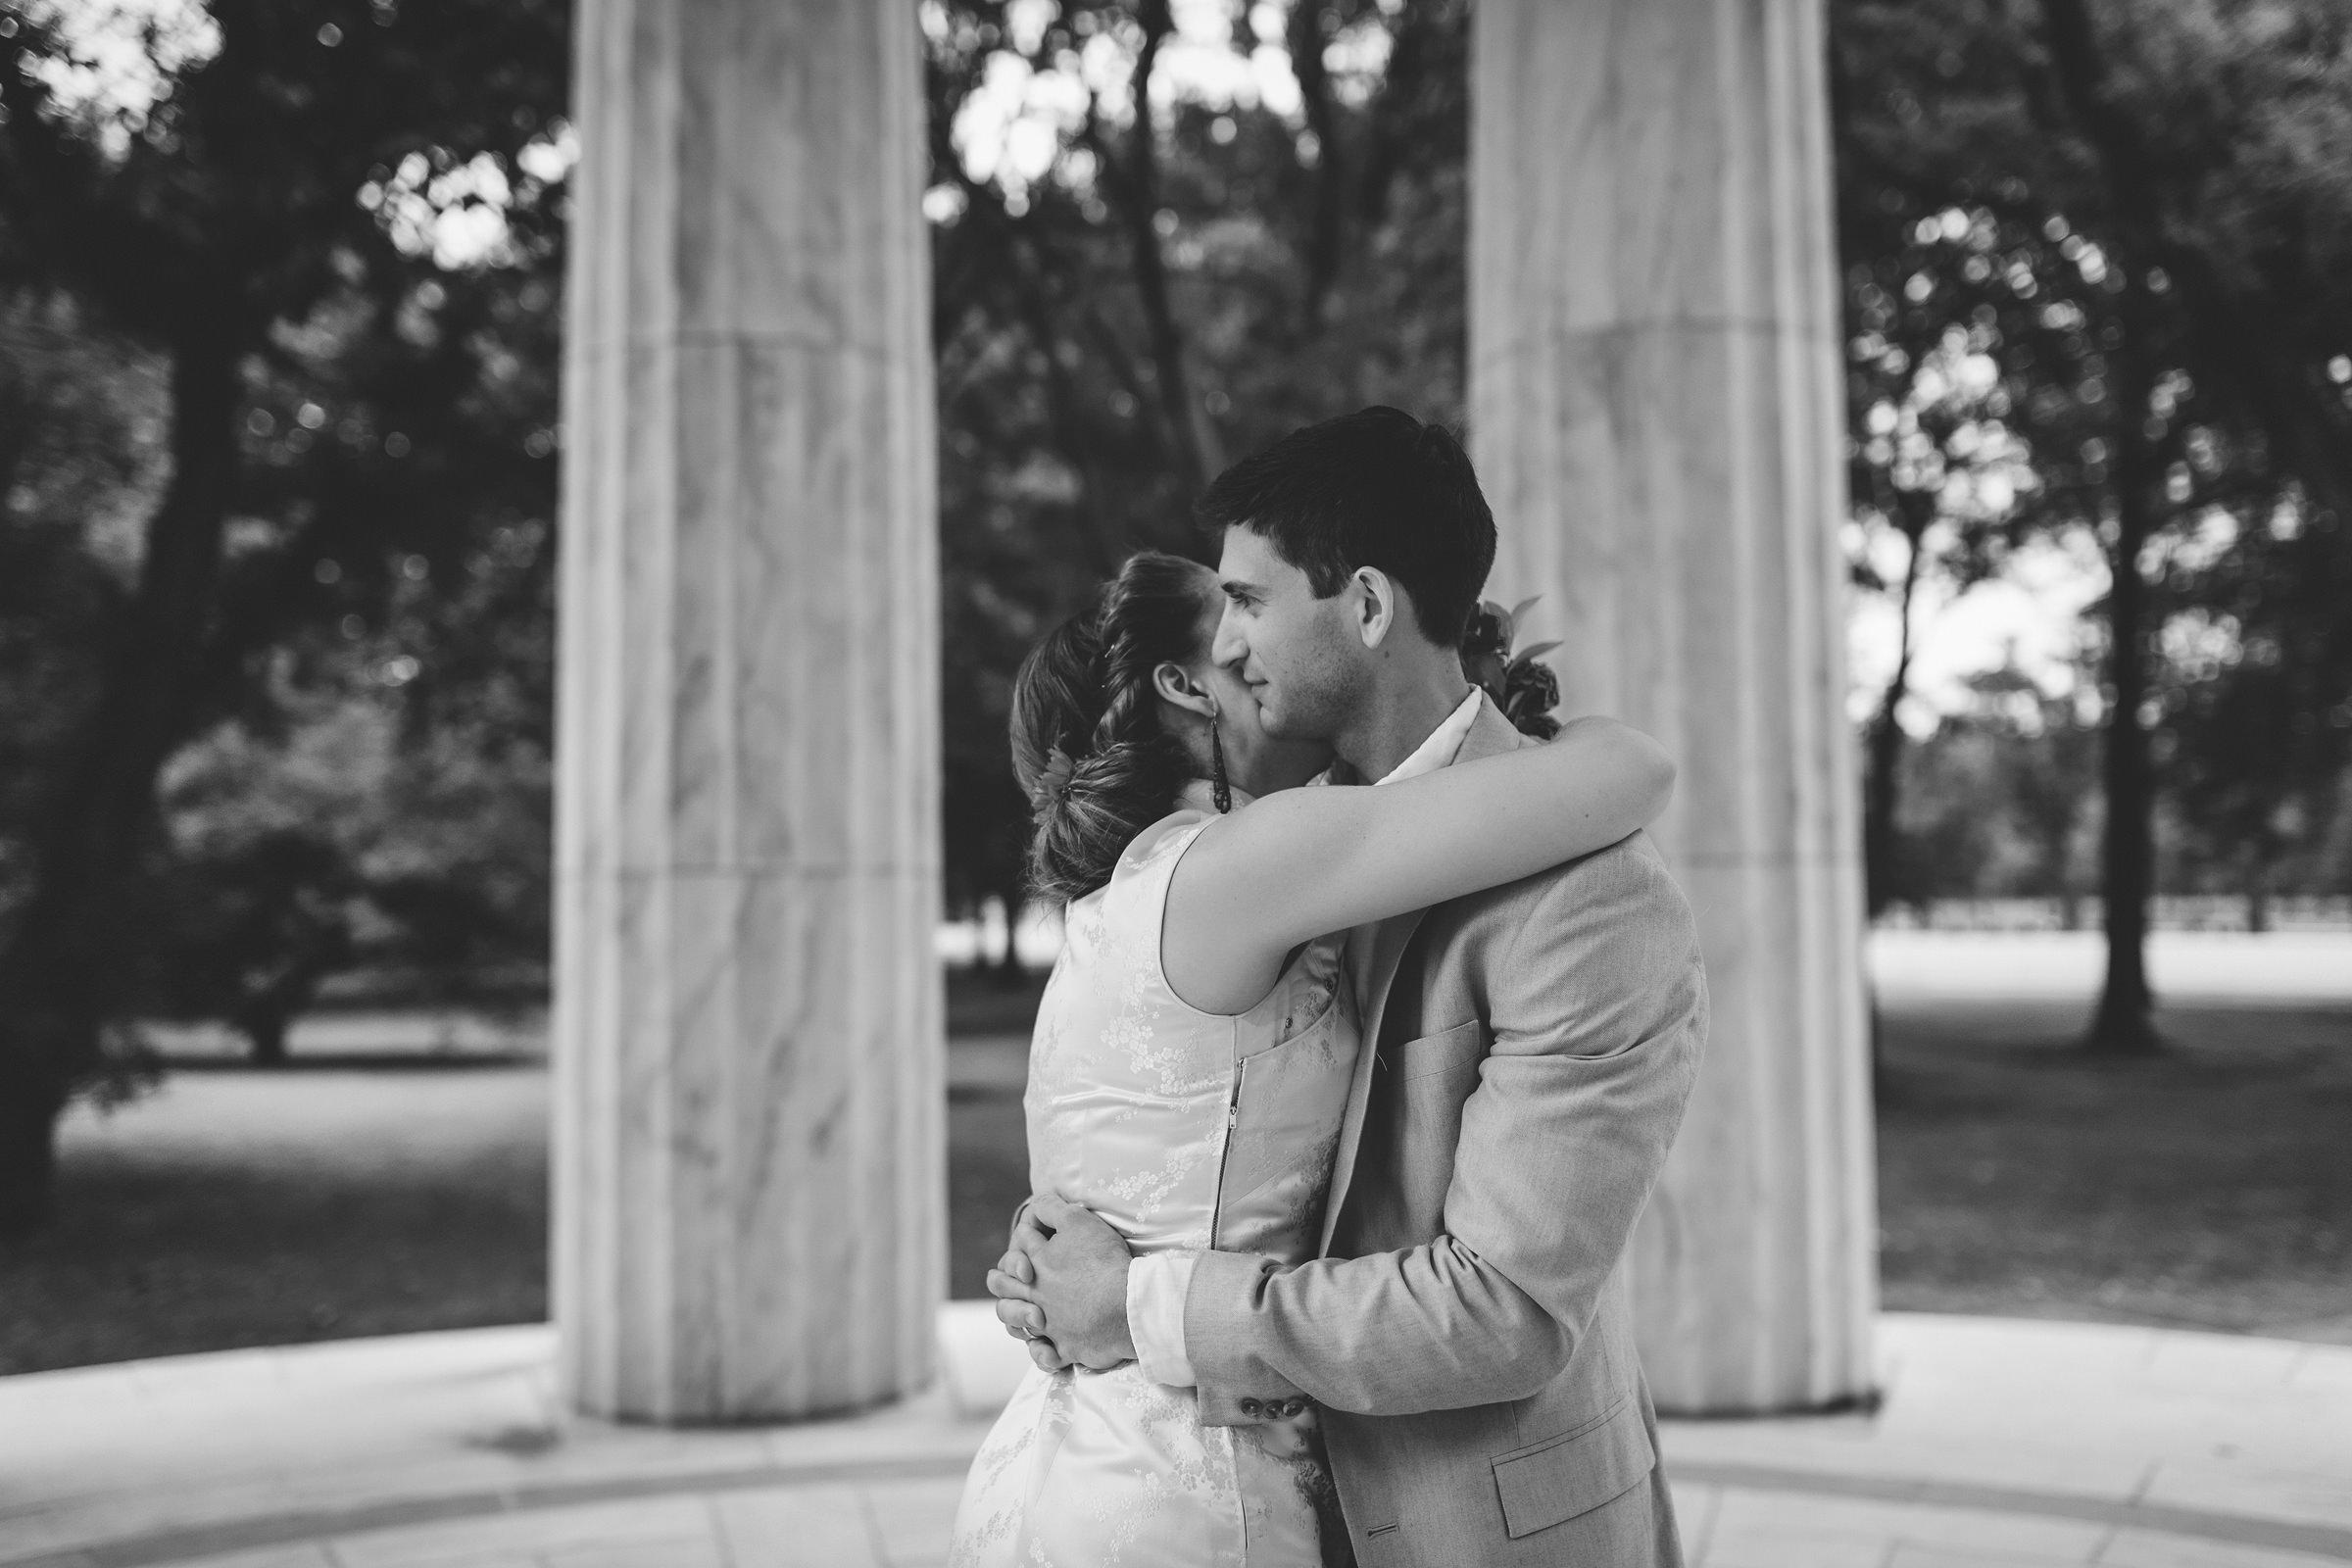 Kentucky_Candid_Wedding_Photographer_108.jpg